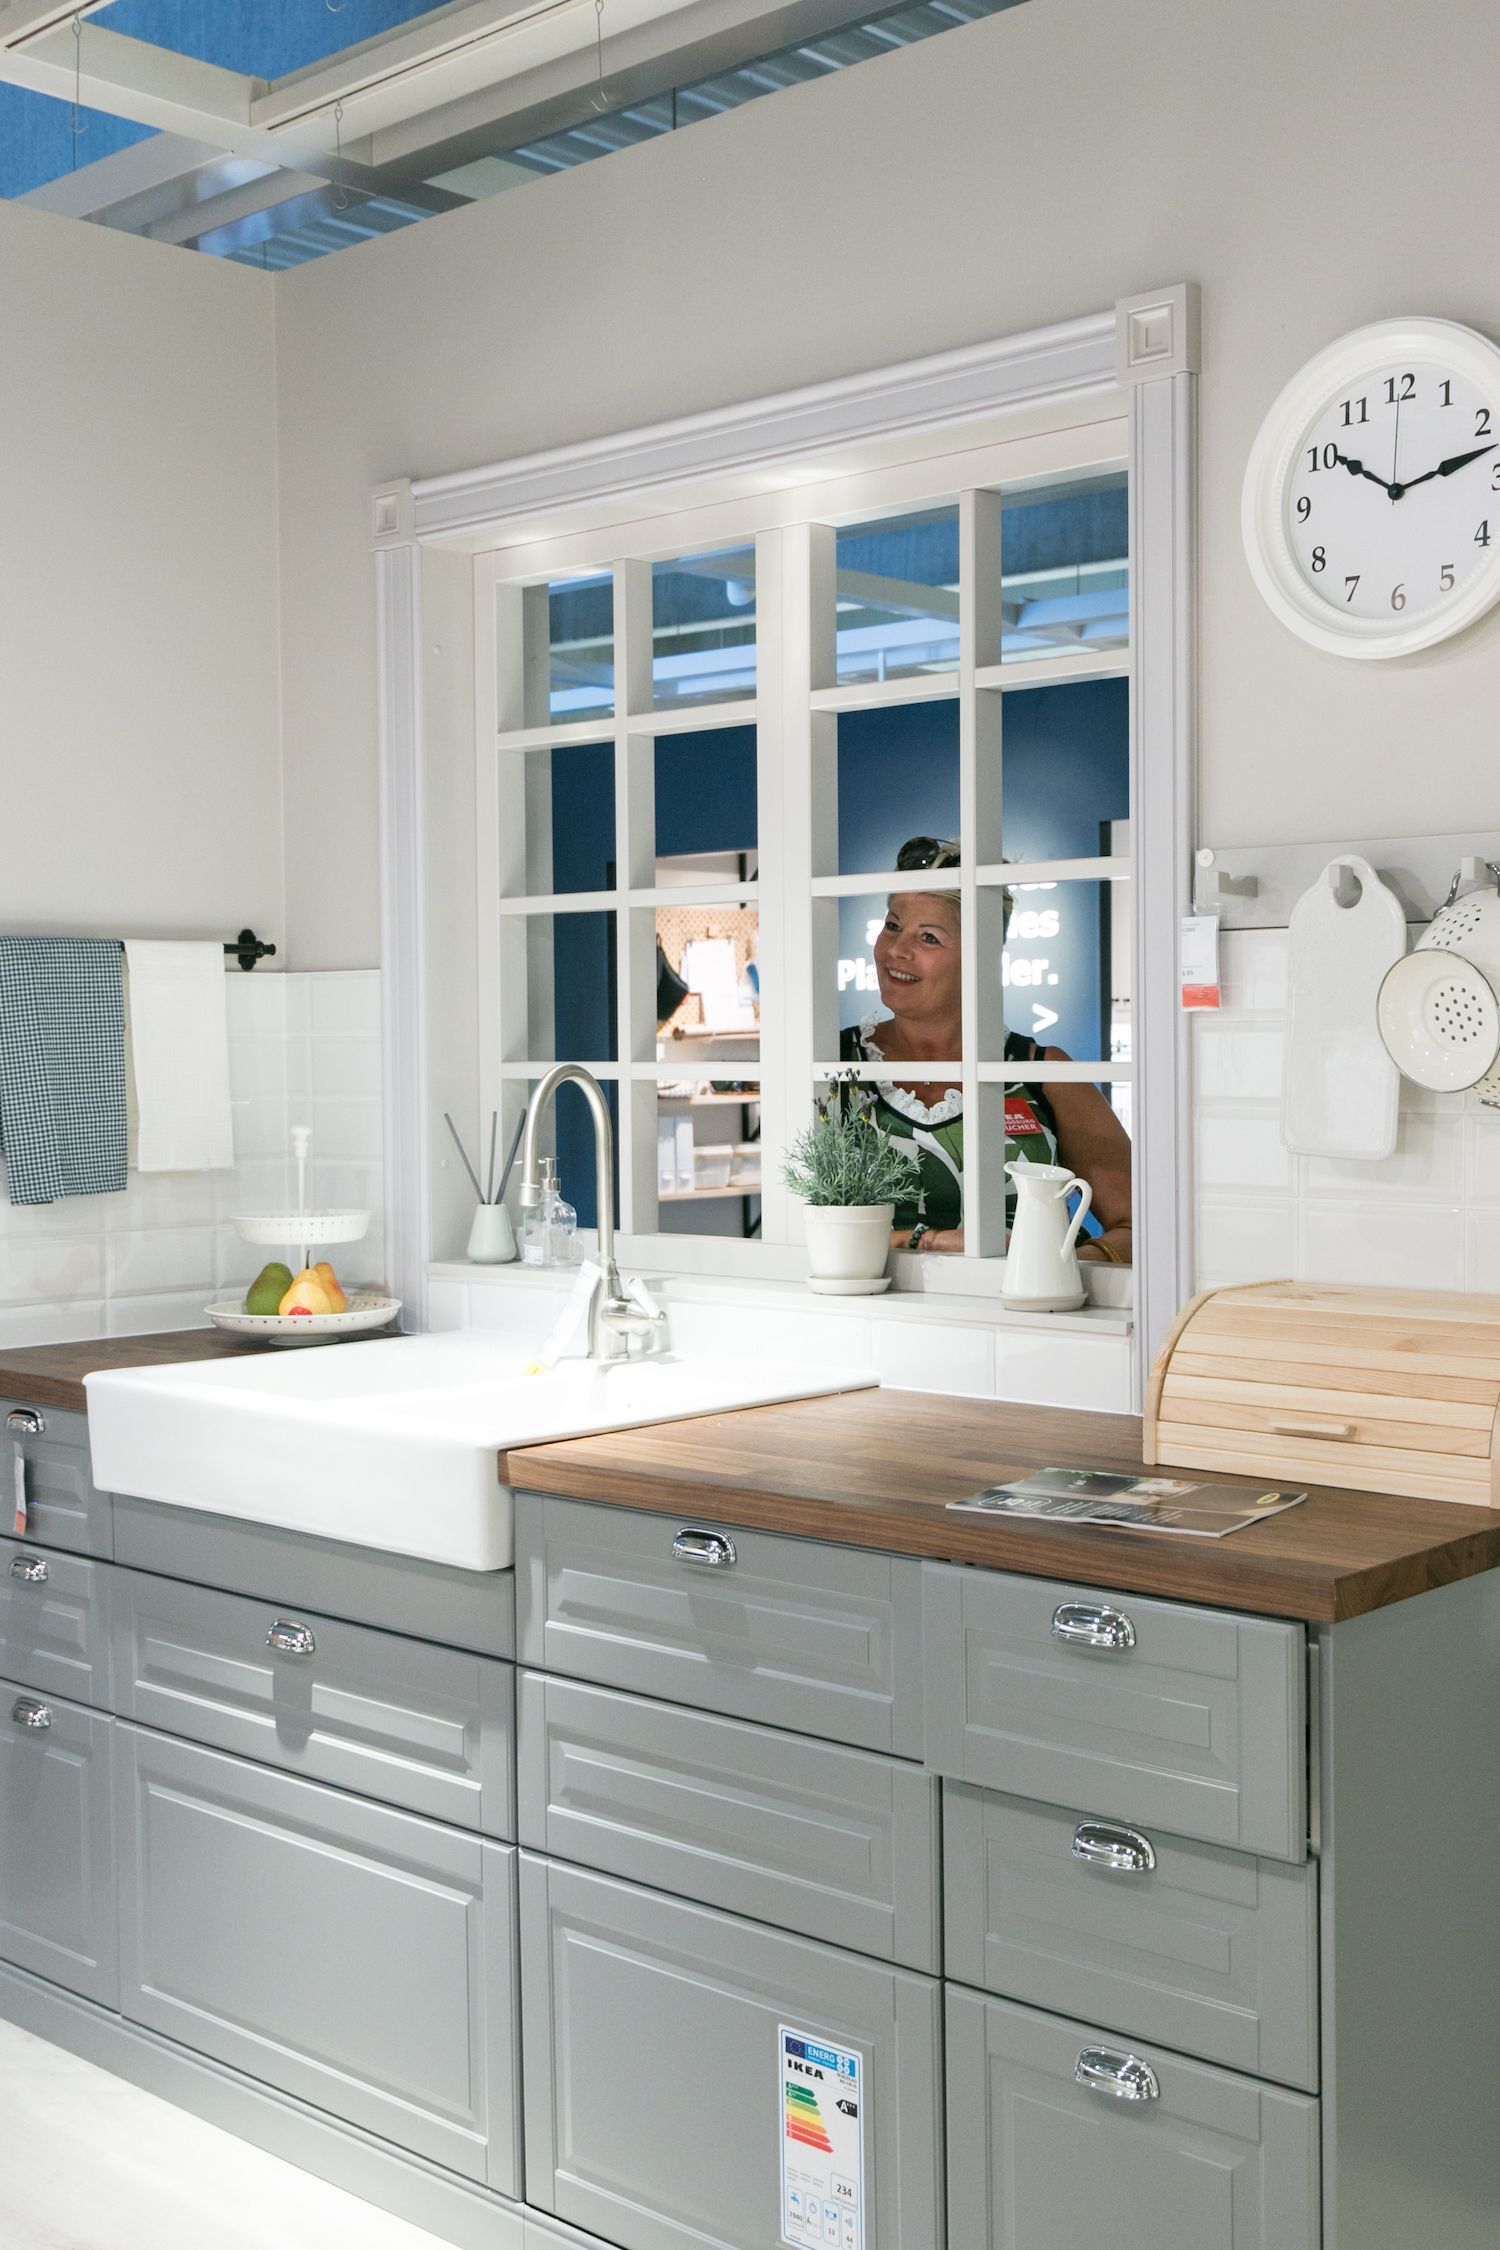 Ikea Kuche Ludwigsburg Grau Landhausstil Kuche Inspiration